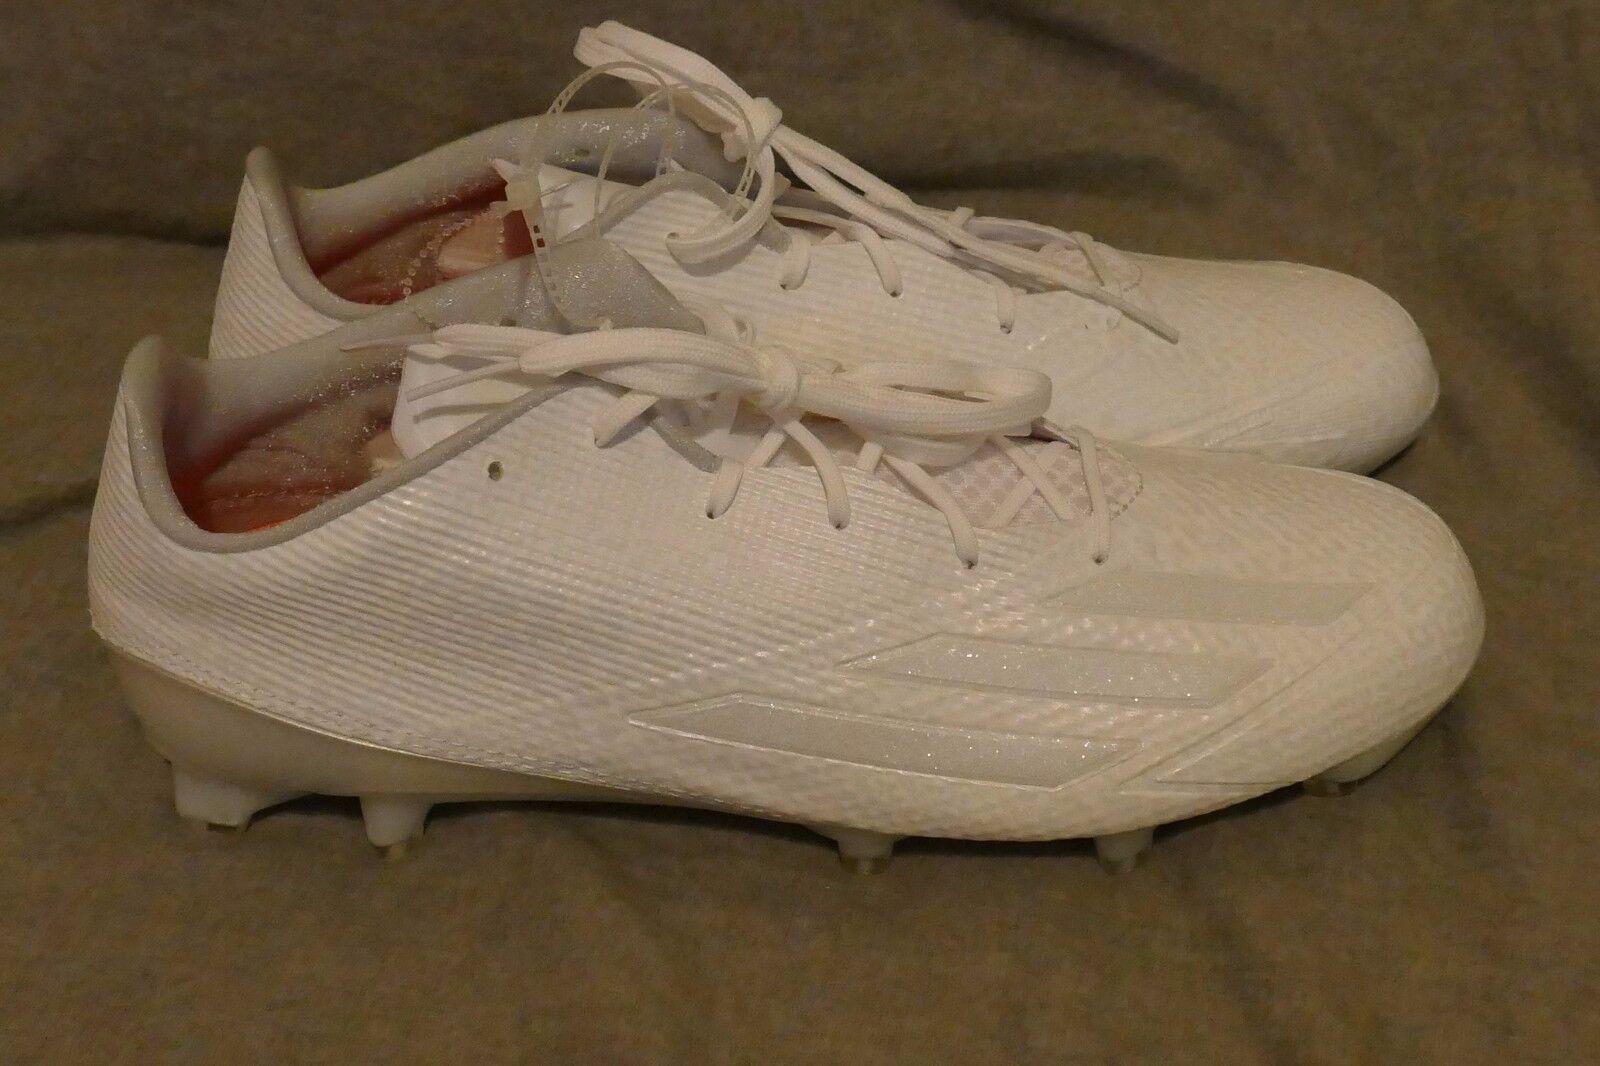 2d5a25fd71a Adidas Adizero 5-Star 5.0 Mens Football Cleats White Men s Size 13.5 Q16063